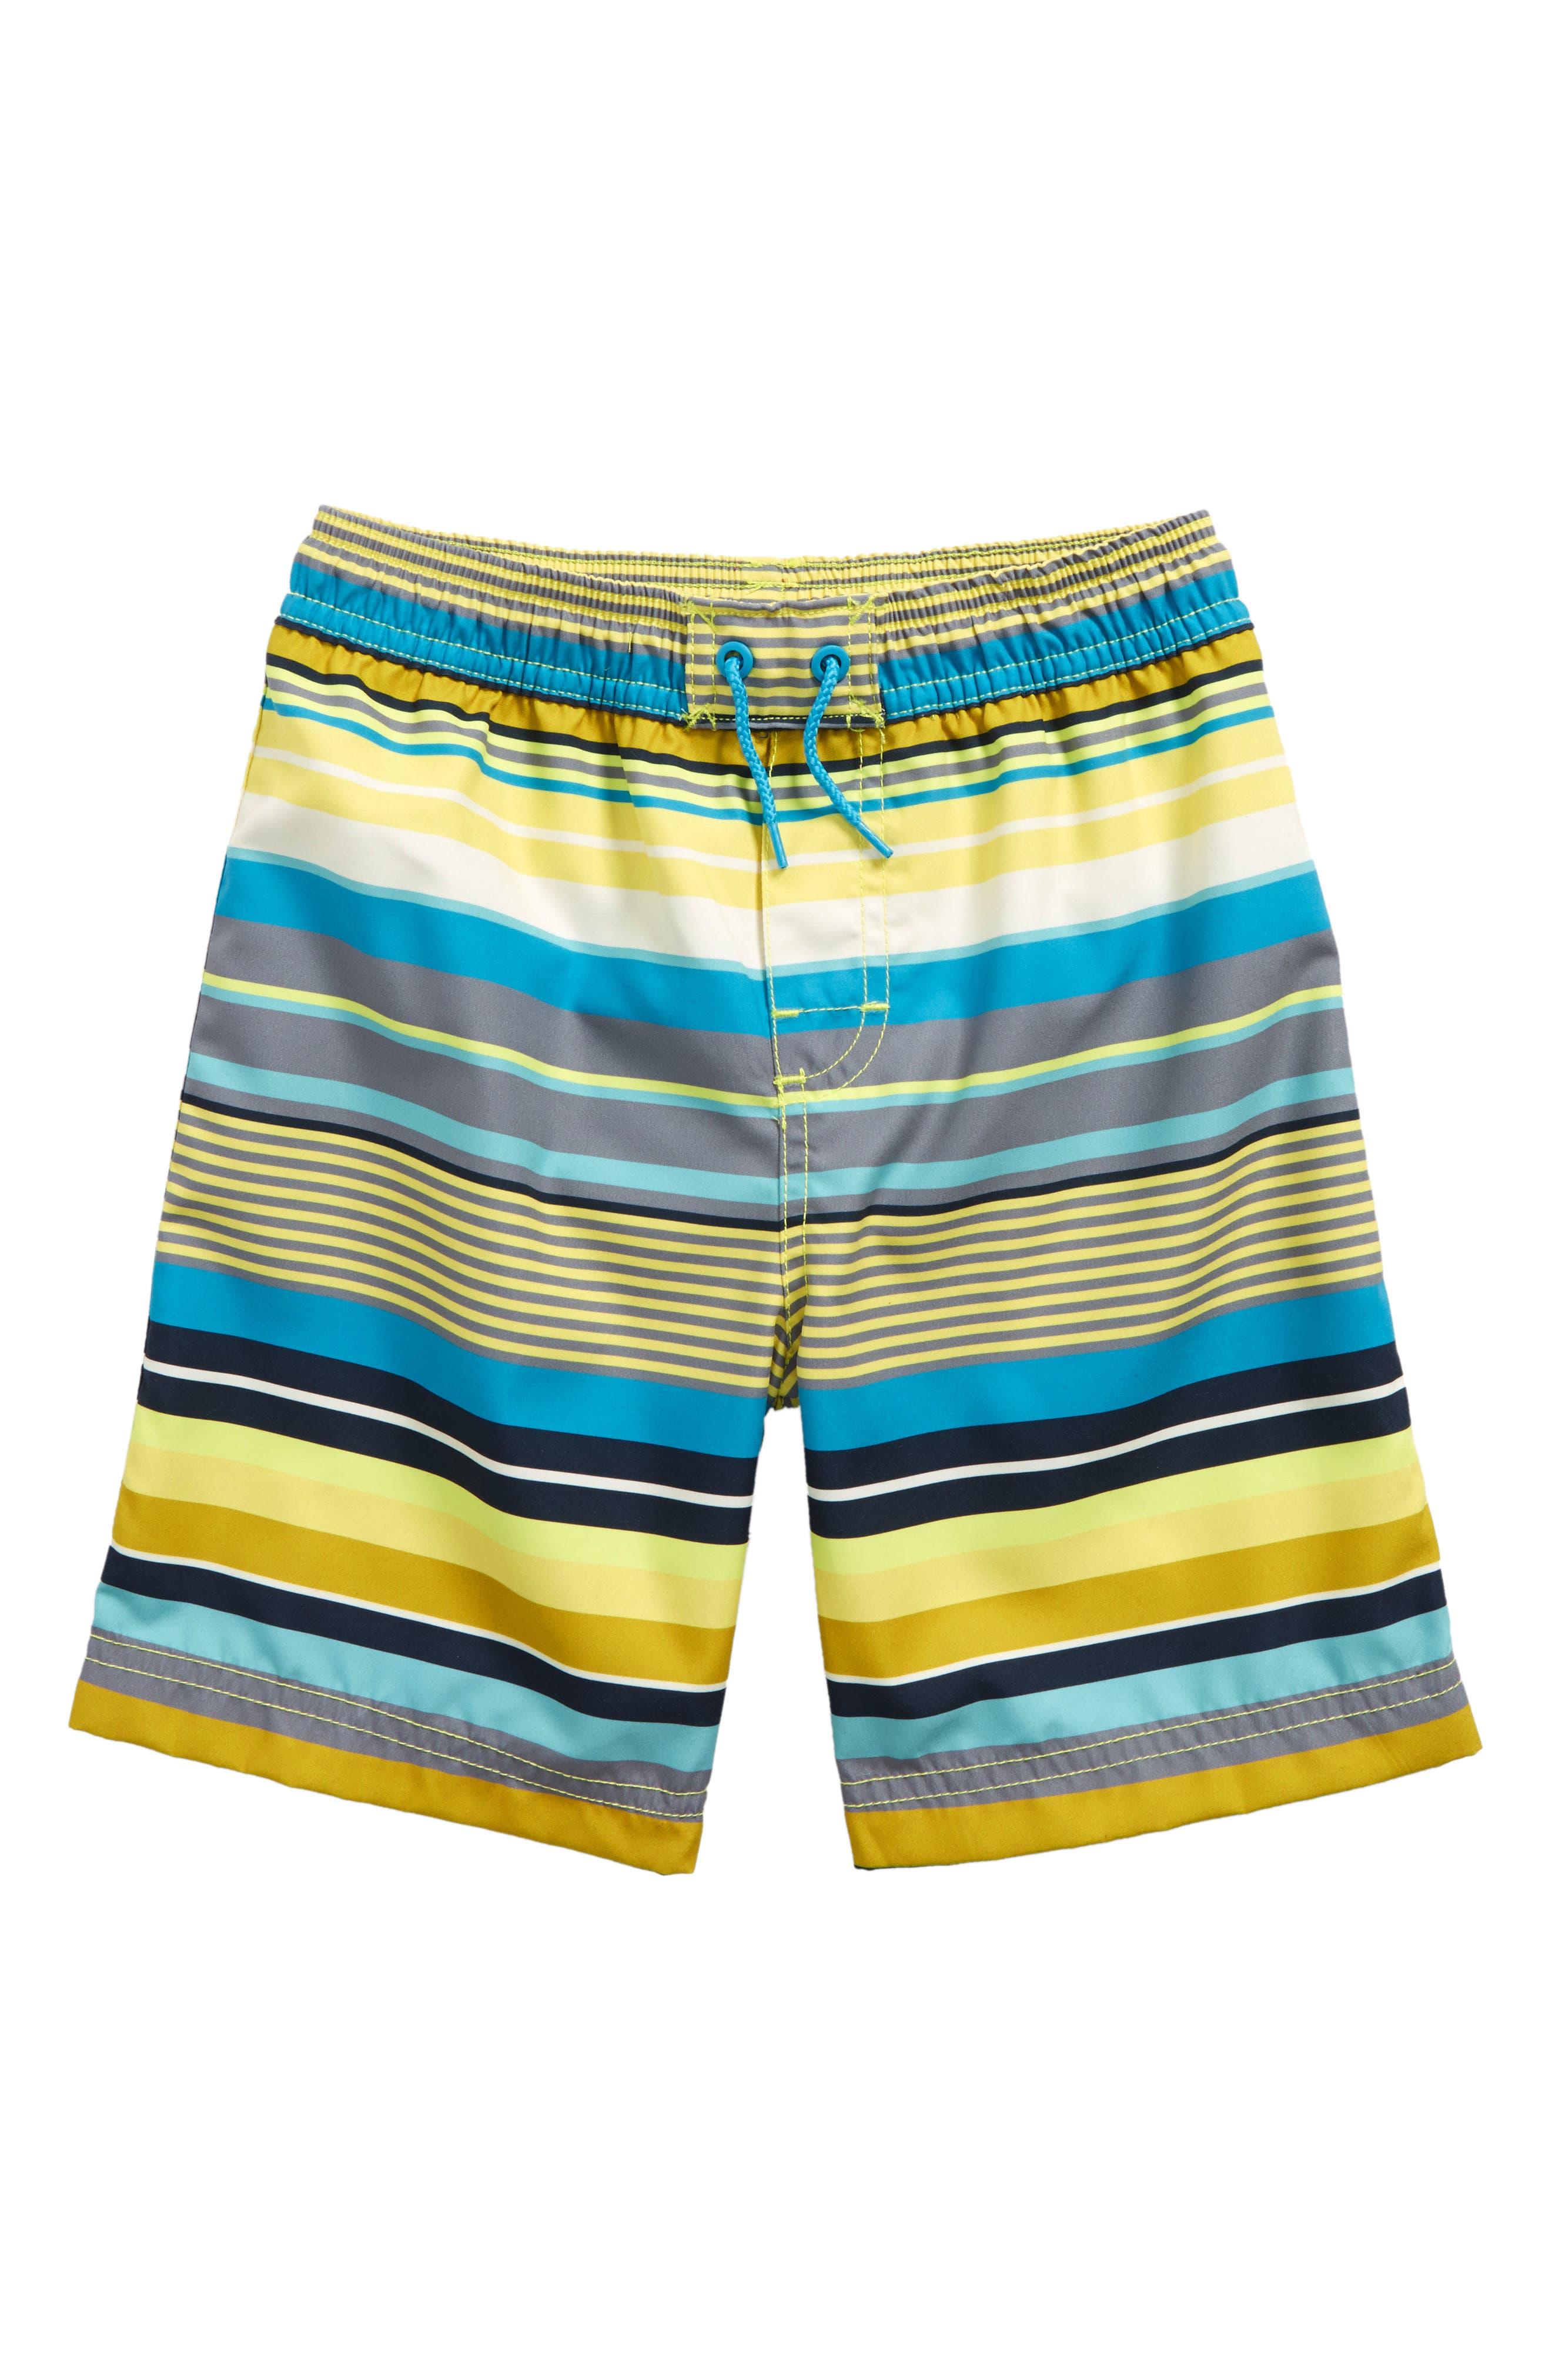 Tea Collection Dawn Patrol Swim Trunks (Toddler Boys & Little Boys)